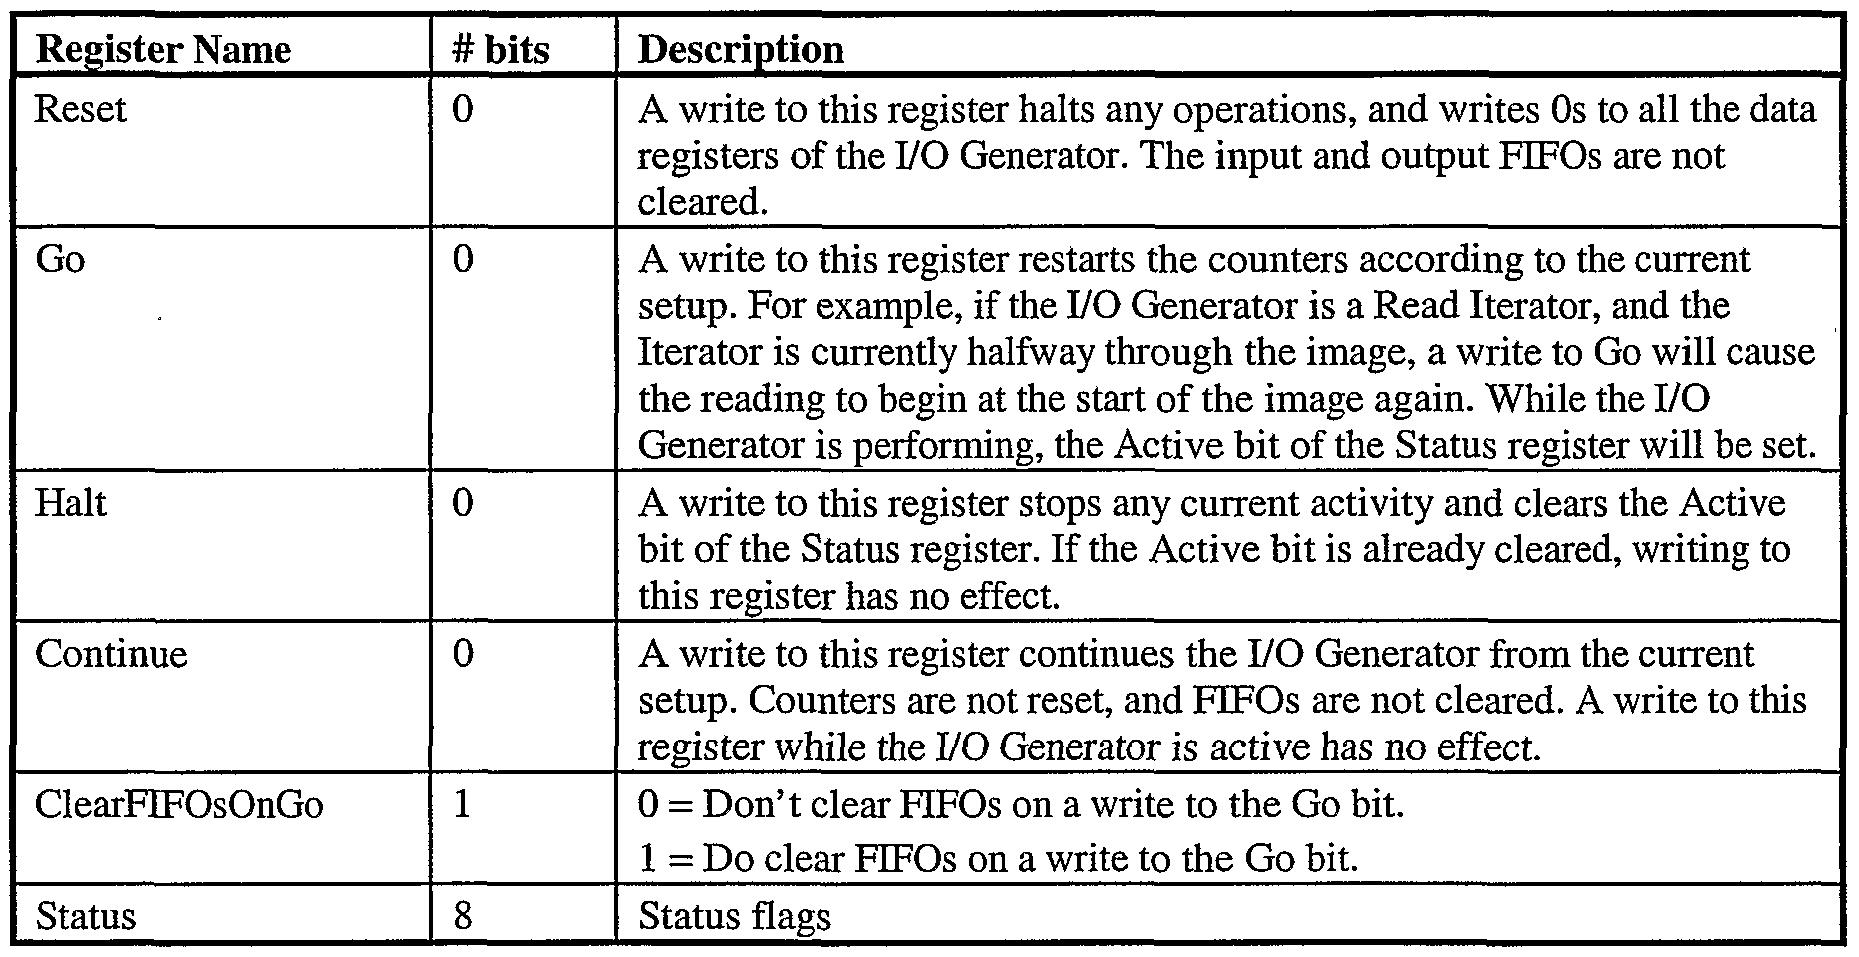 patent wo2003013866a1 printing cartridge barcode patent wo2003013866a1 printing cartridge barcode identification google patents